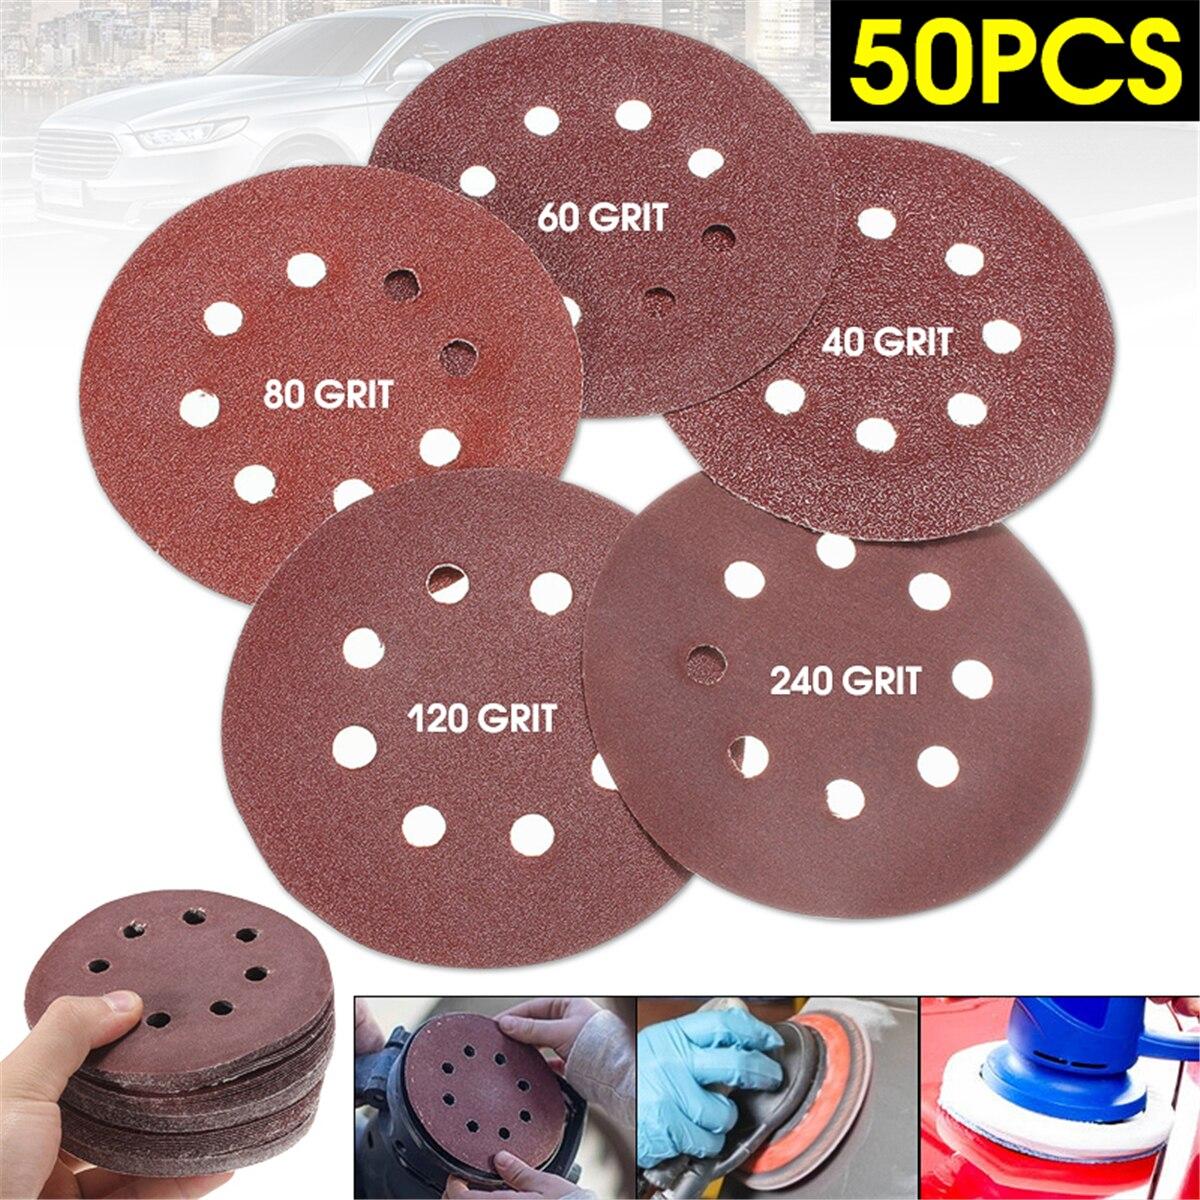 50pcs/Set 125mm Sanding Disc Round Shape 8 Hole Mixed 40 60 80 120 240 Grit Orbital Paper Punch Sheet Sandpaper Polisher Sanders